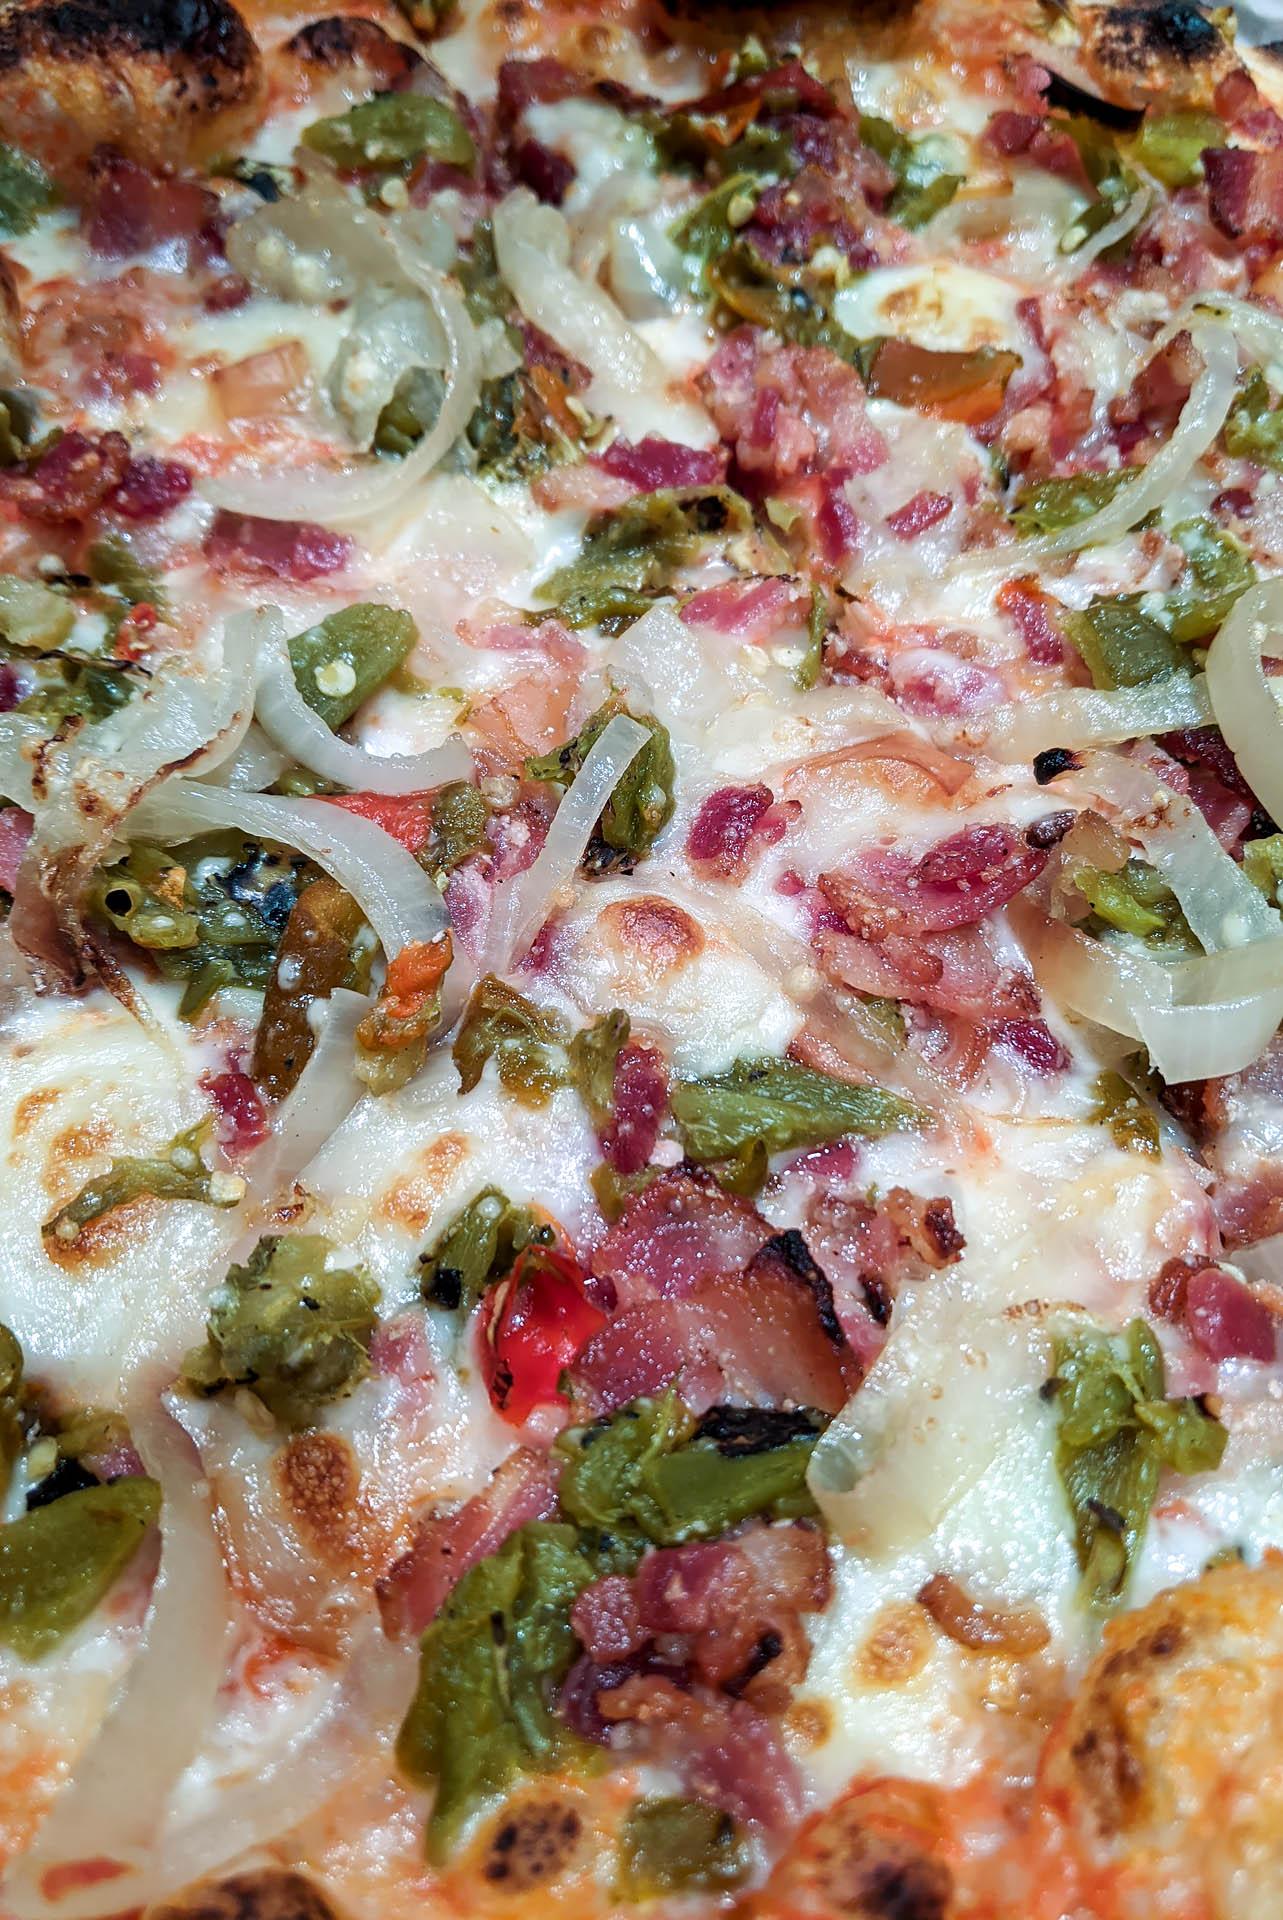 Bacon green chili